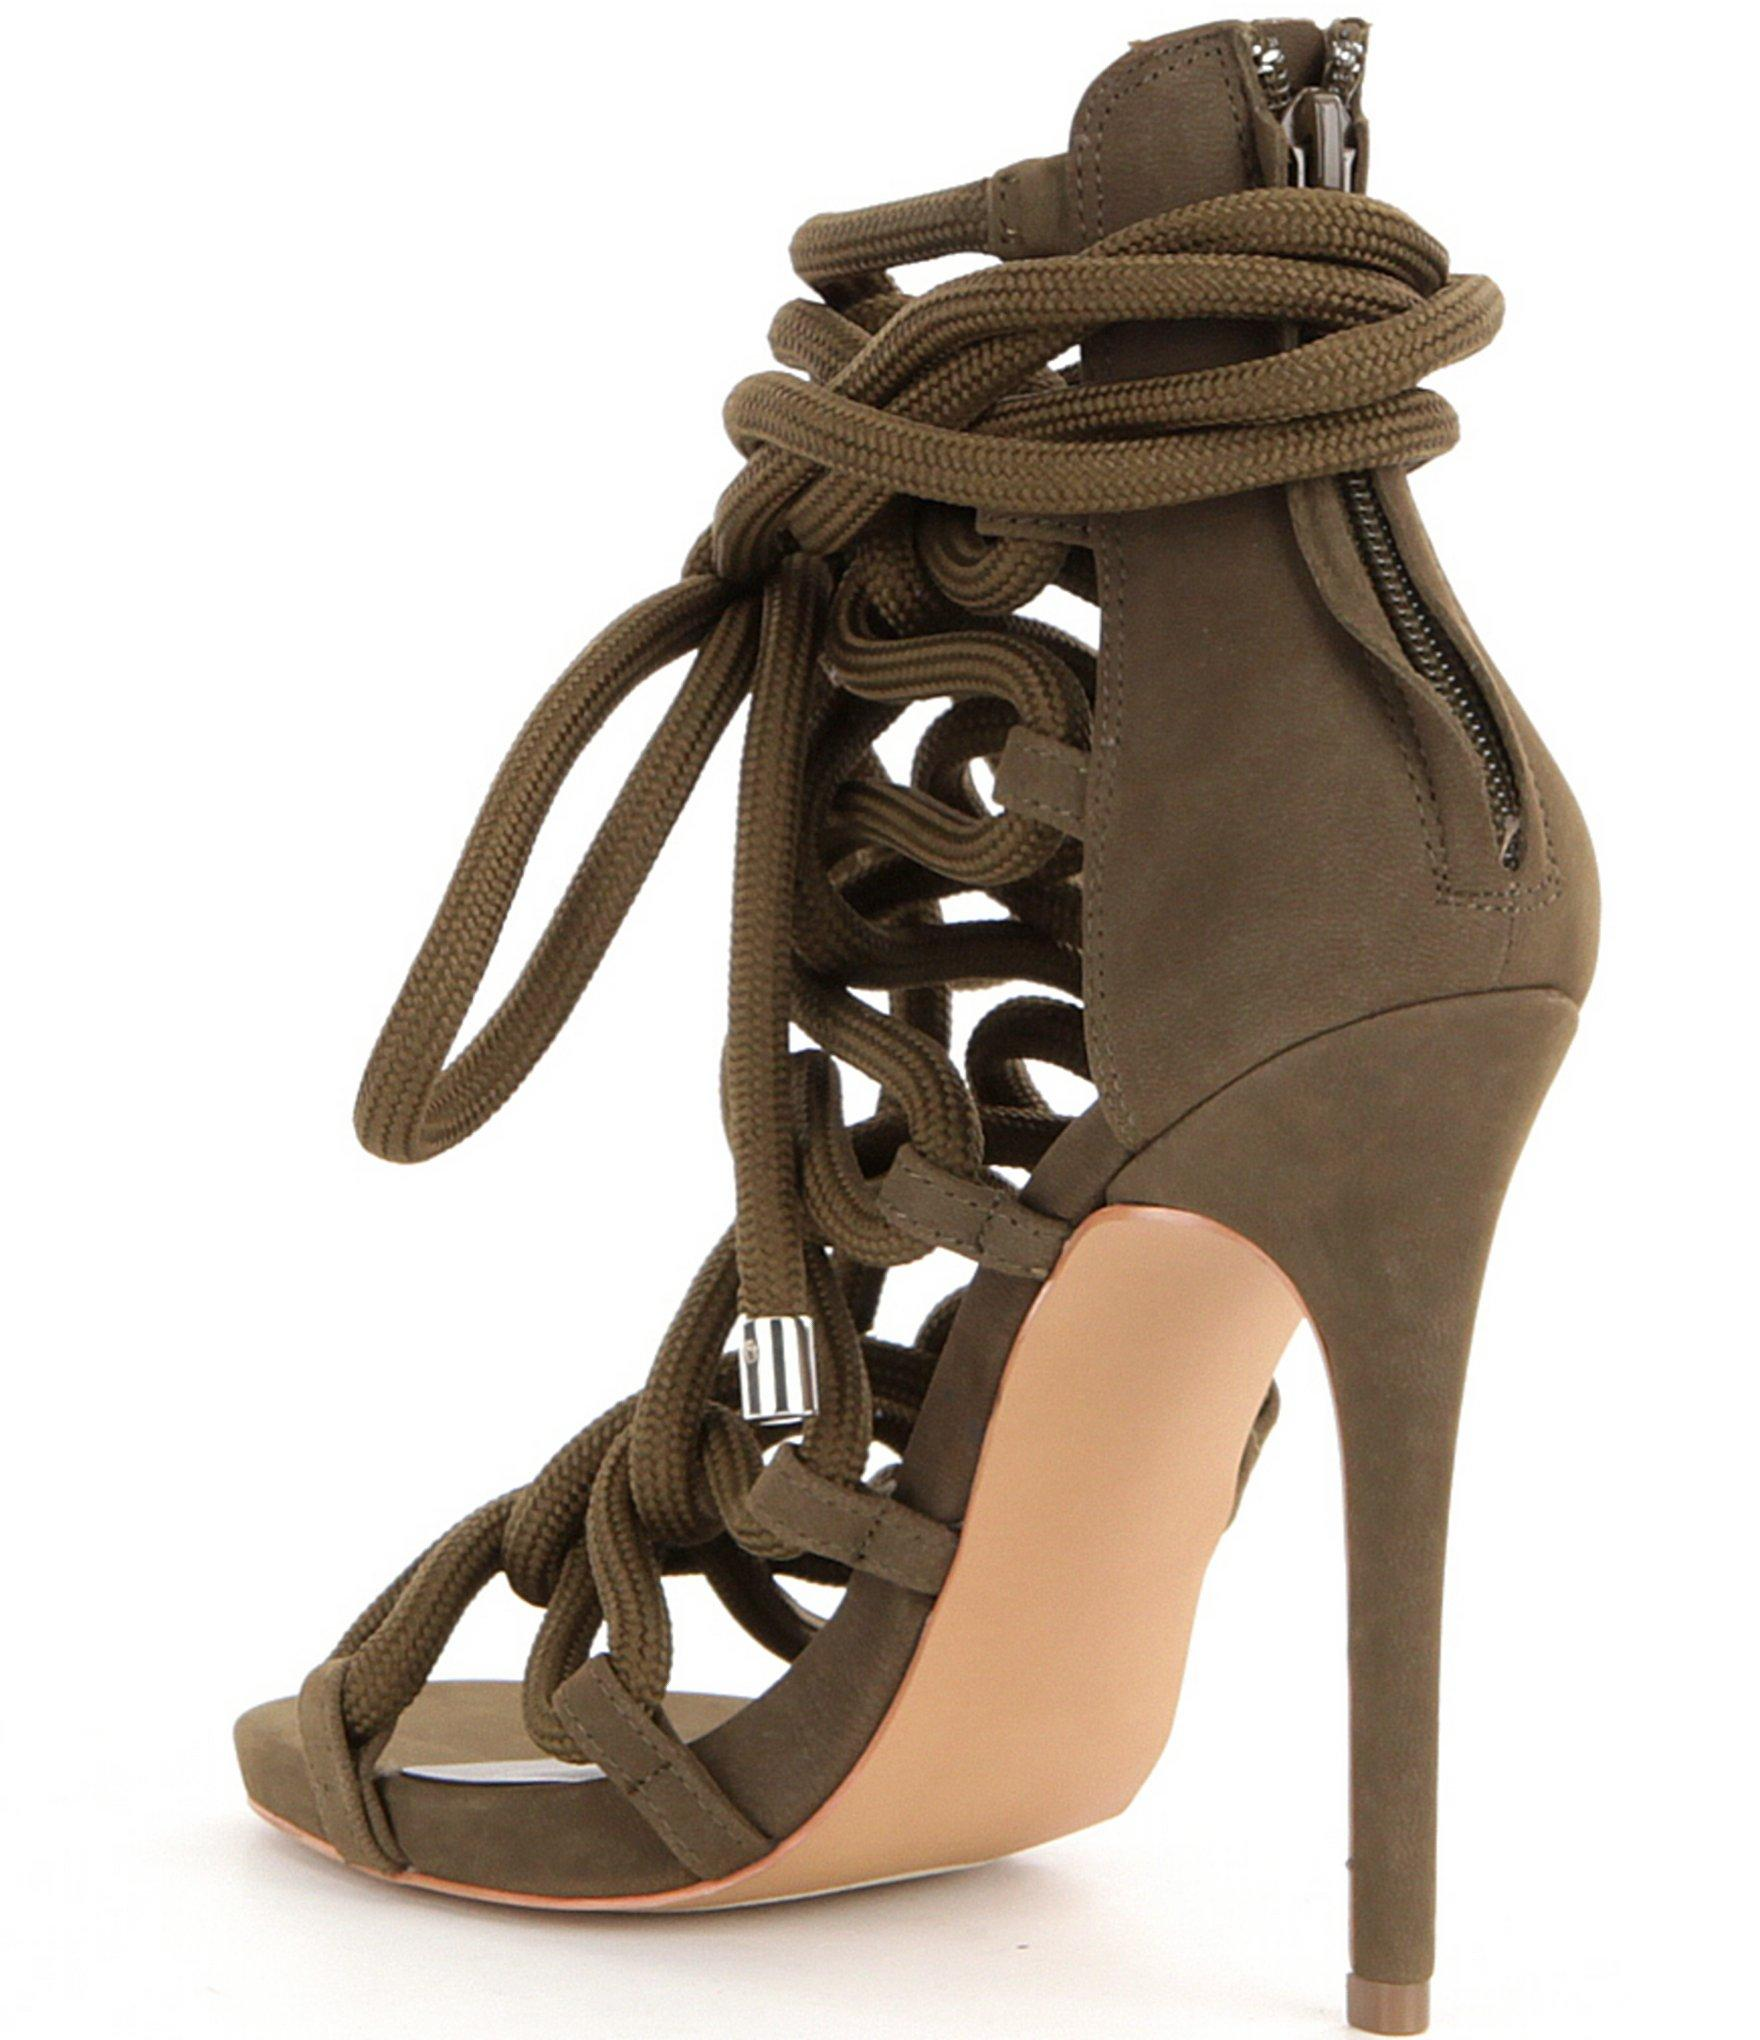 5e0543f9ae1e9 Steve Madden Dancin Back Zip Bungee Inspired Lace-up High Heel Dress  Sandals in Green - Lyst